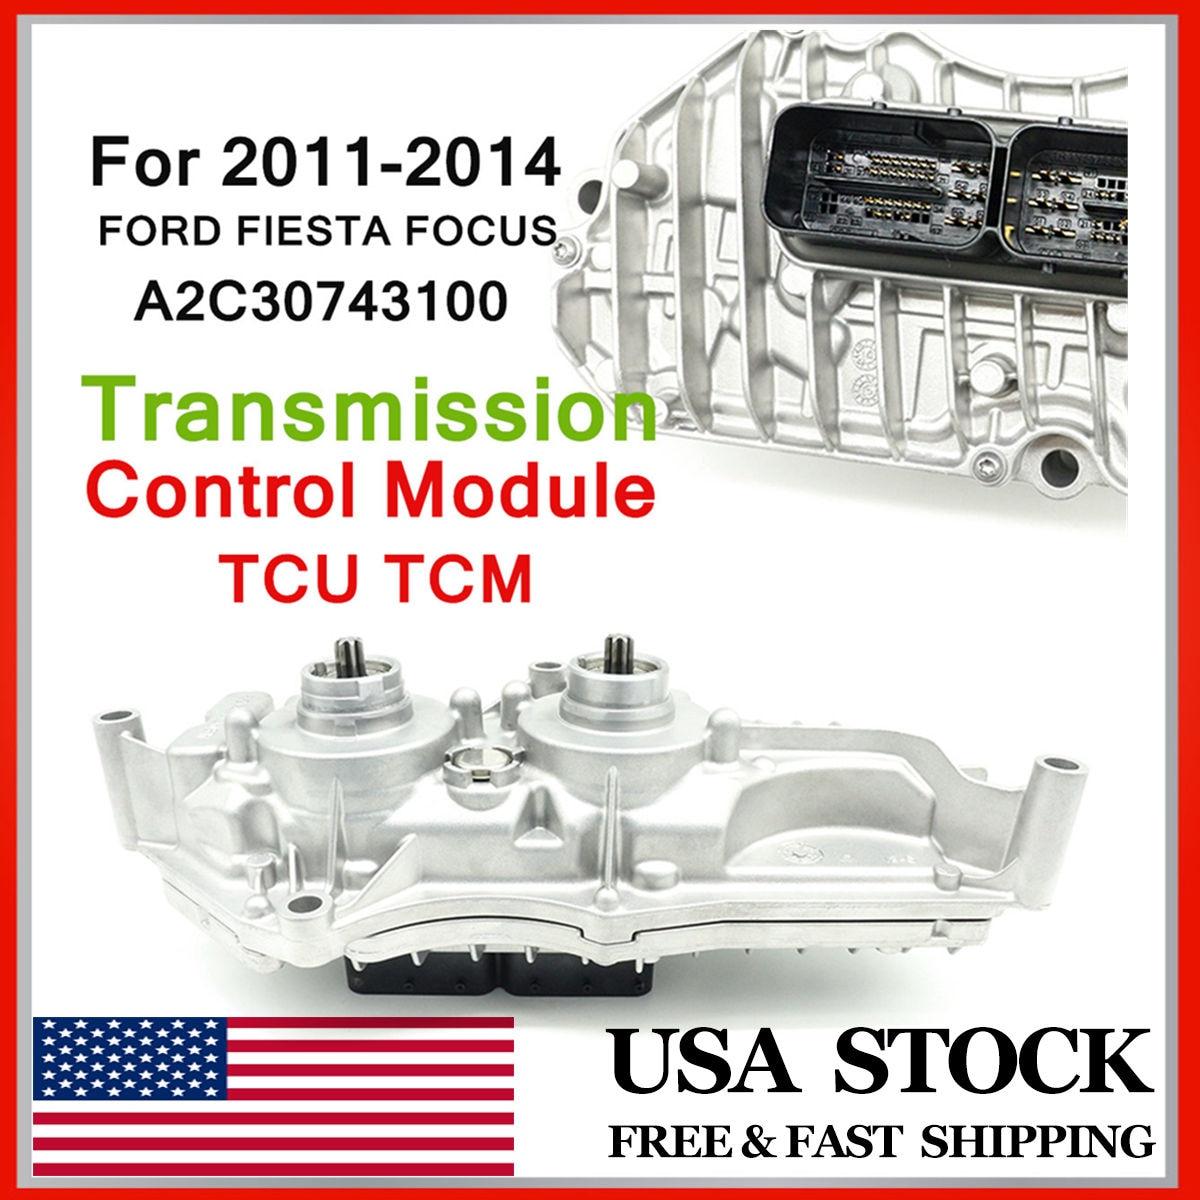 Transmission Control Module For FORDd FOCUS 2011-2014 Transmission Control Module TCU TCM A2C30743100 Control Module TCU TCM(China)